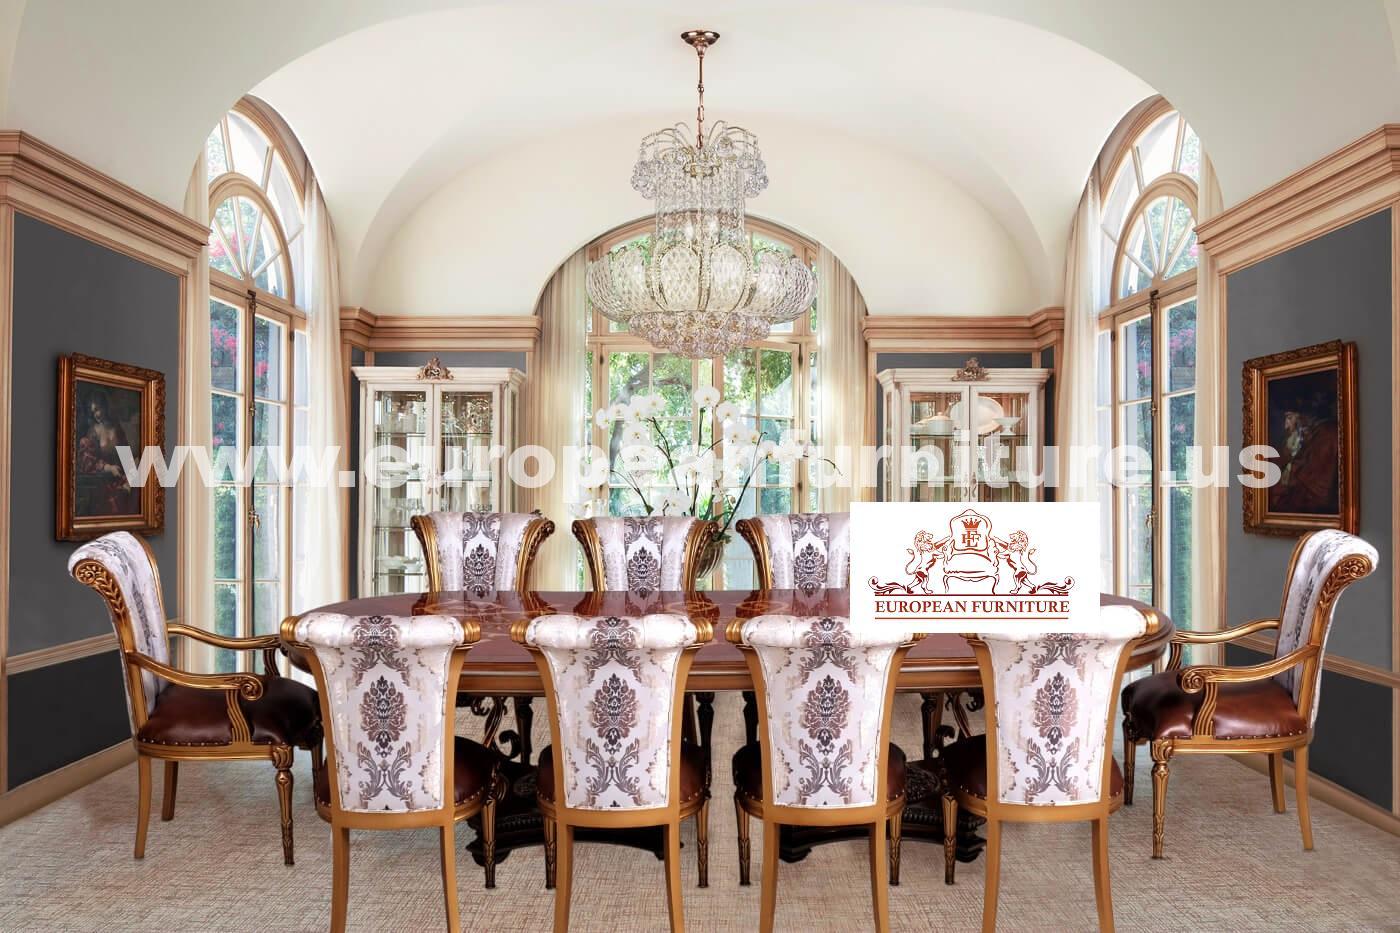 Ordinaire European Furniture